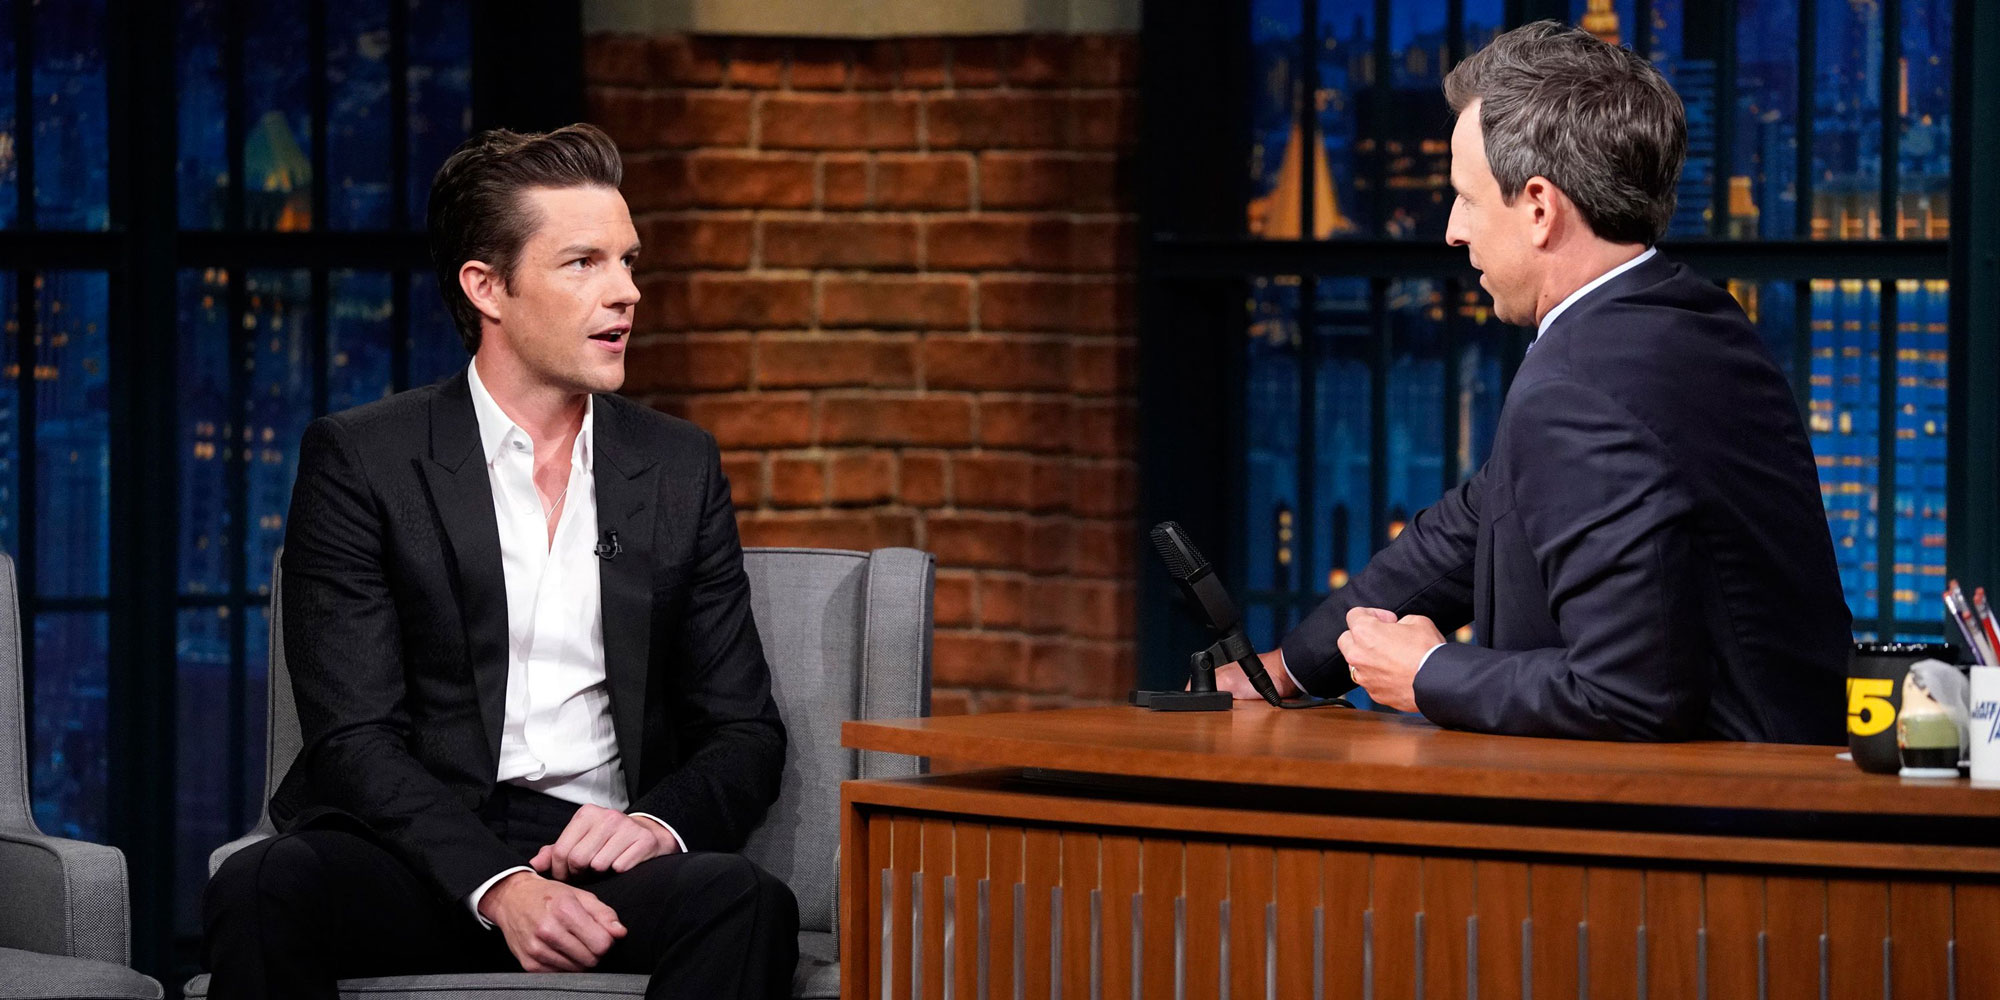 Intervista al Late Night with Seth Meyers